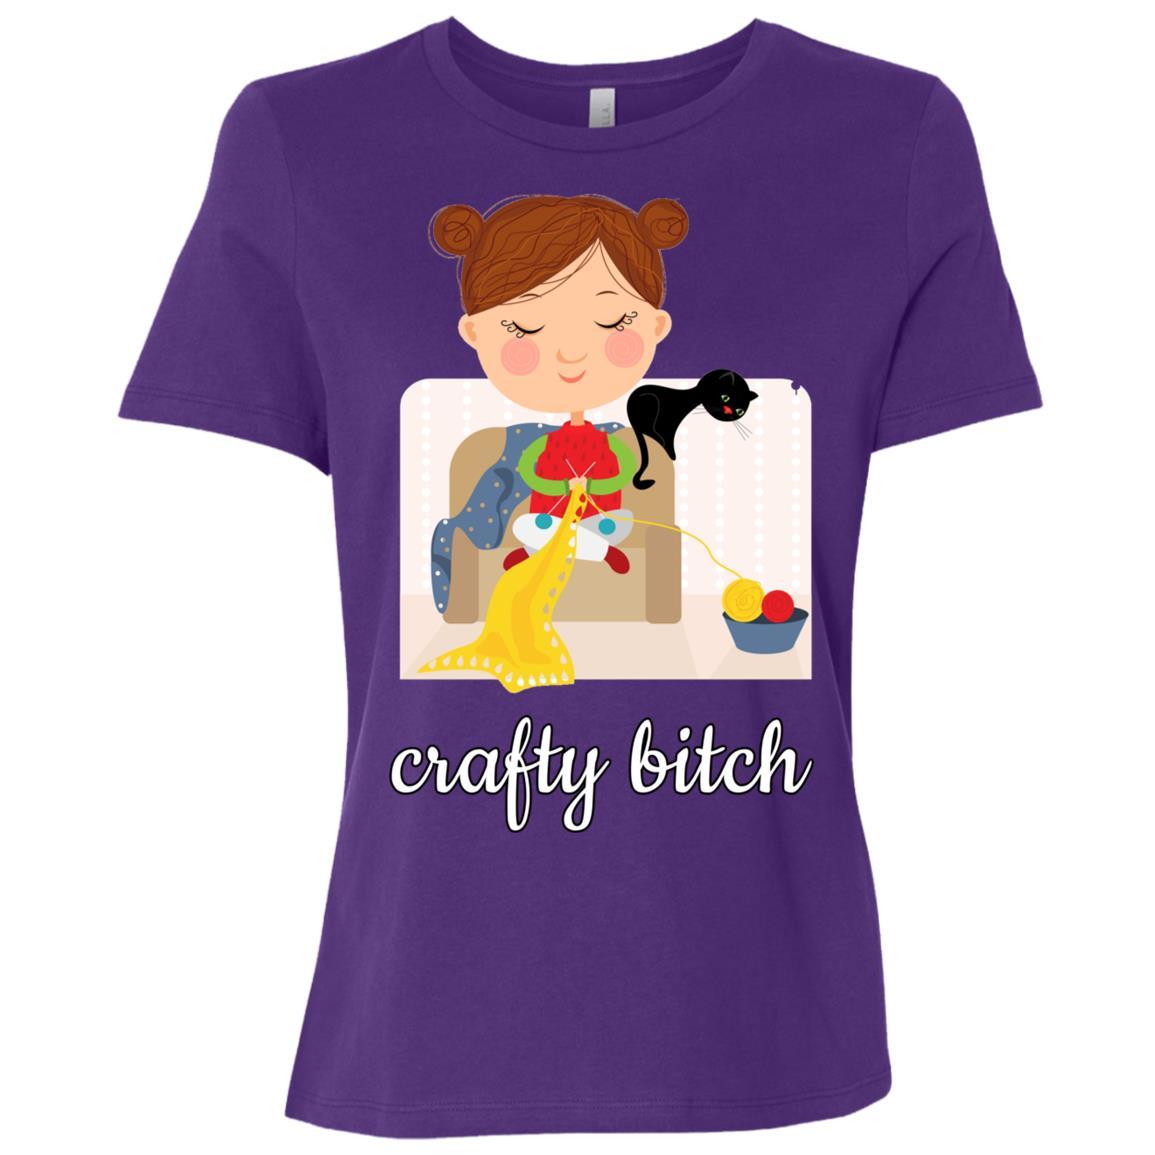 Crafty Bitch Knitting With Cat Women Short Sleeve T-Shirt